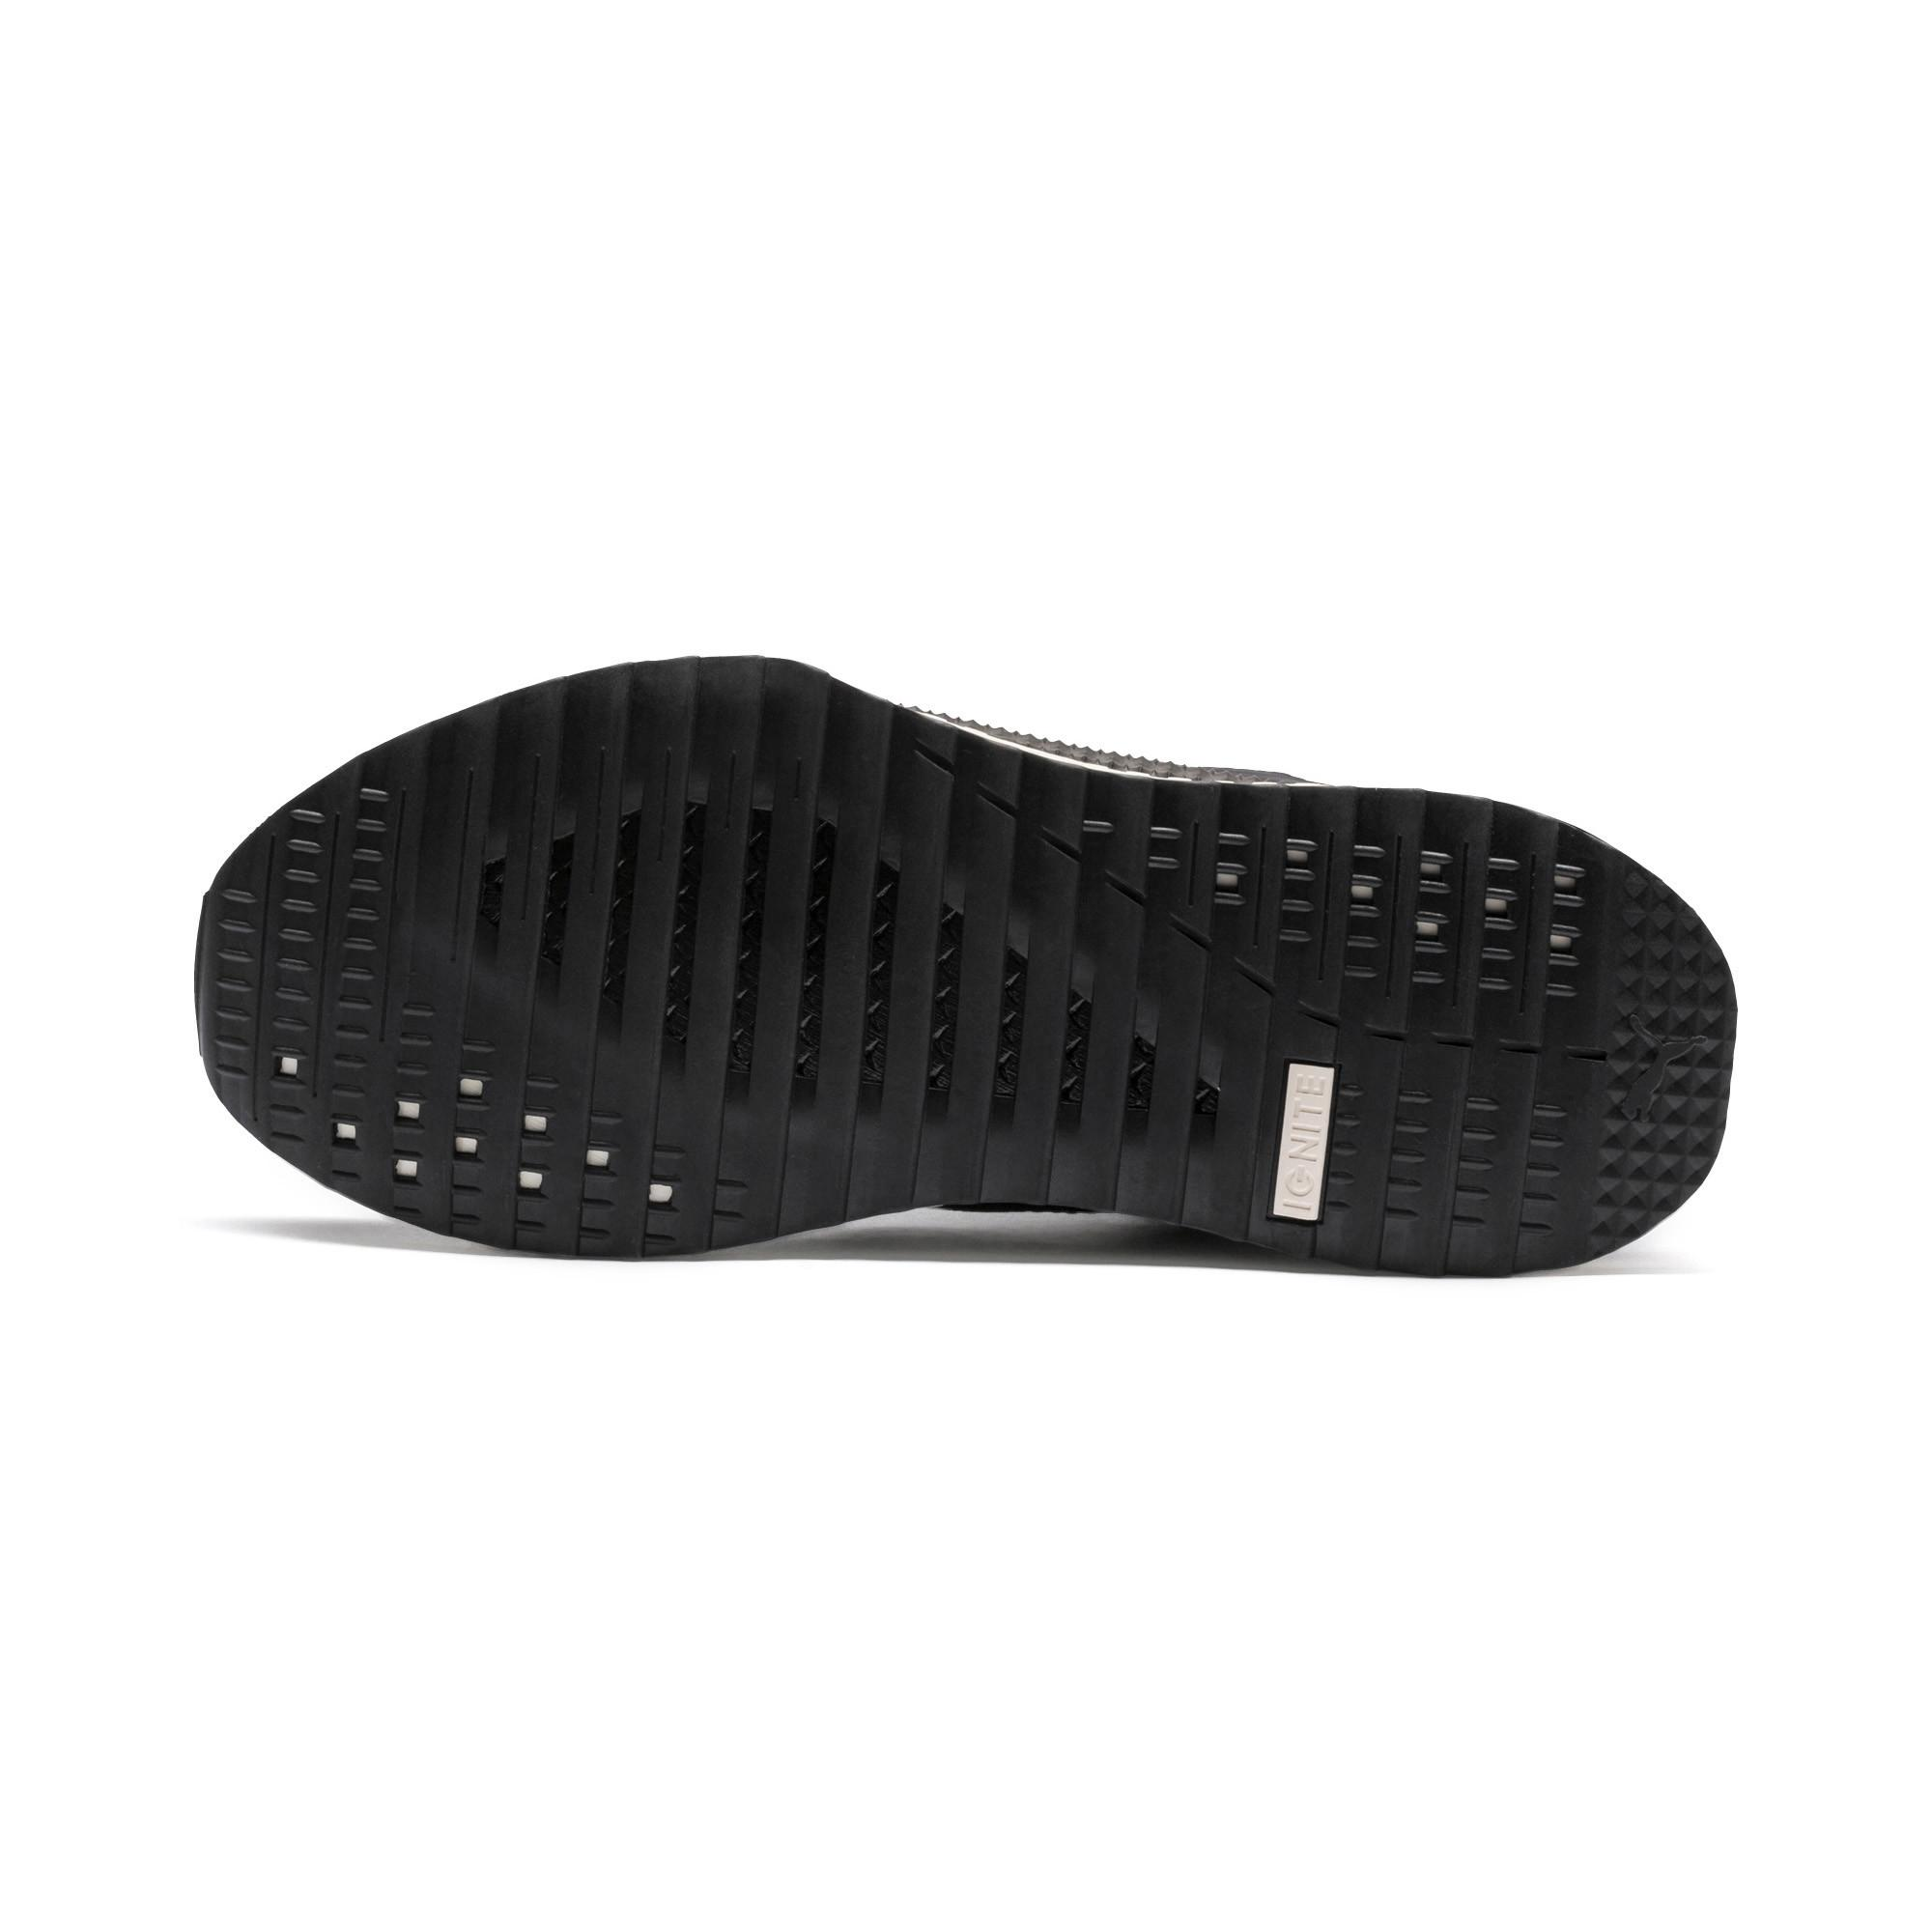 39d78a2a561 PUMA - Black Tsugi Cage Premium Sneakers for Men - Lyst. View fullscreen